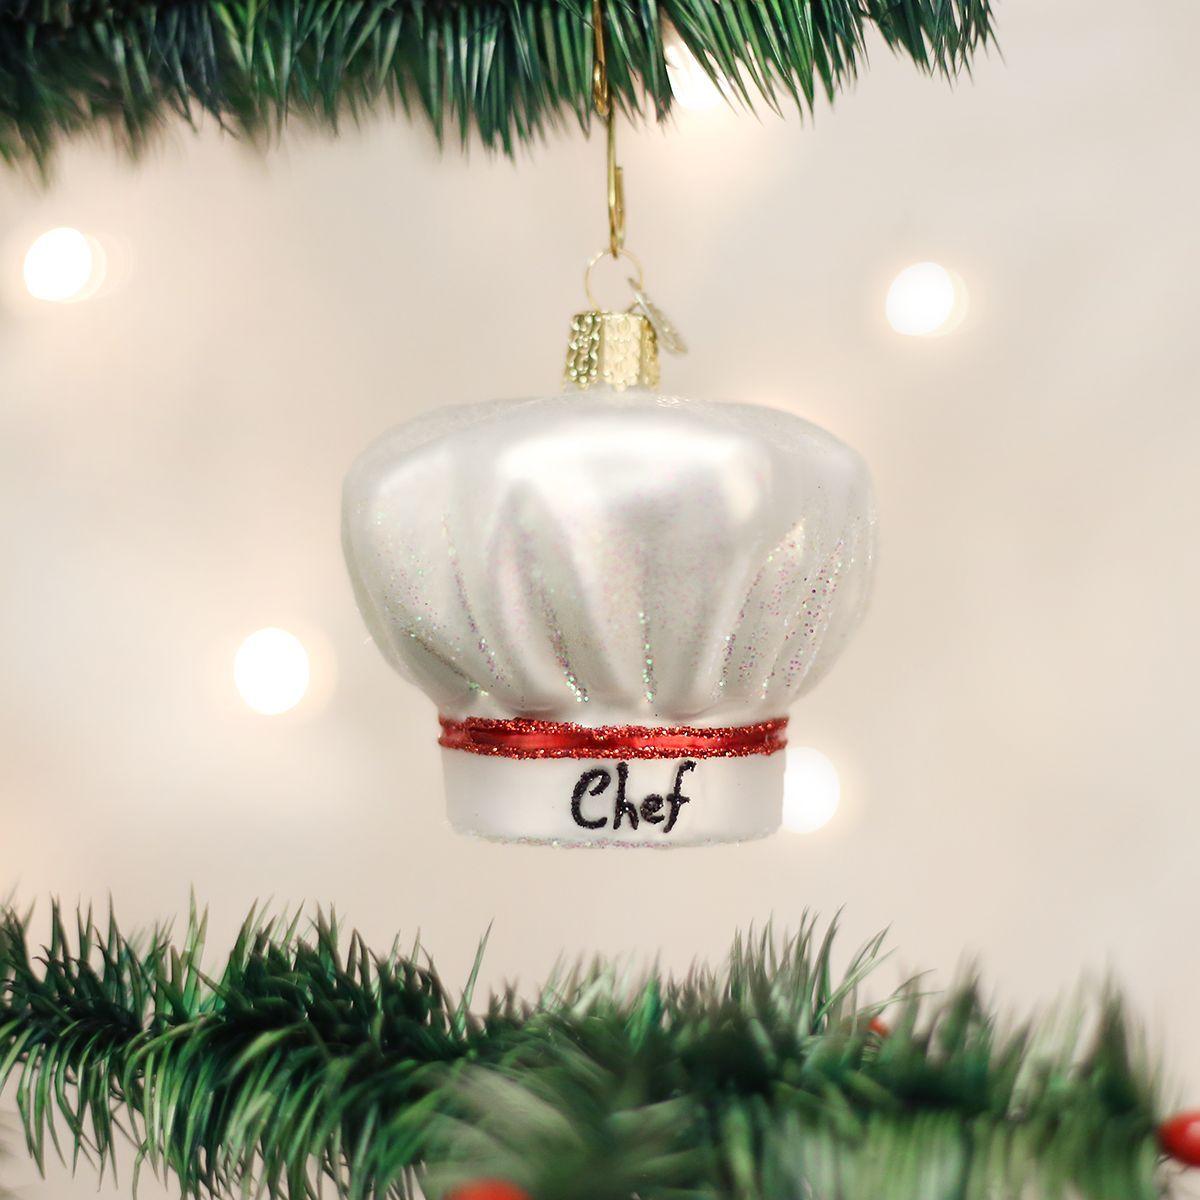 OLD WORLD CHRISTMAS CHEF/'S HAT GLASS CHRISTMAS ORNAMENT 32239